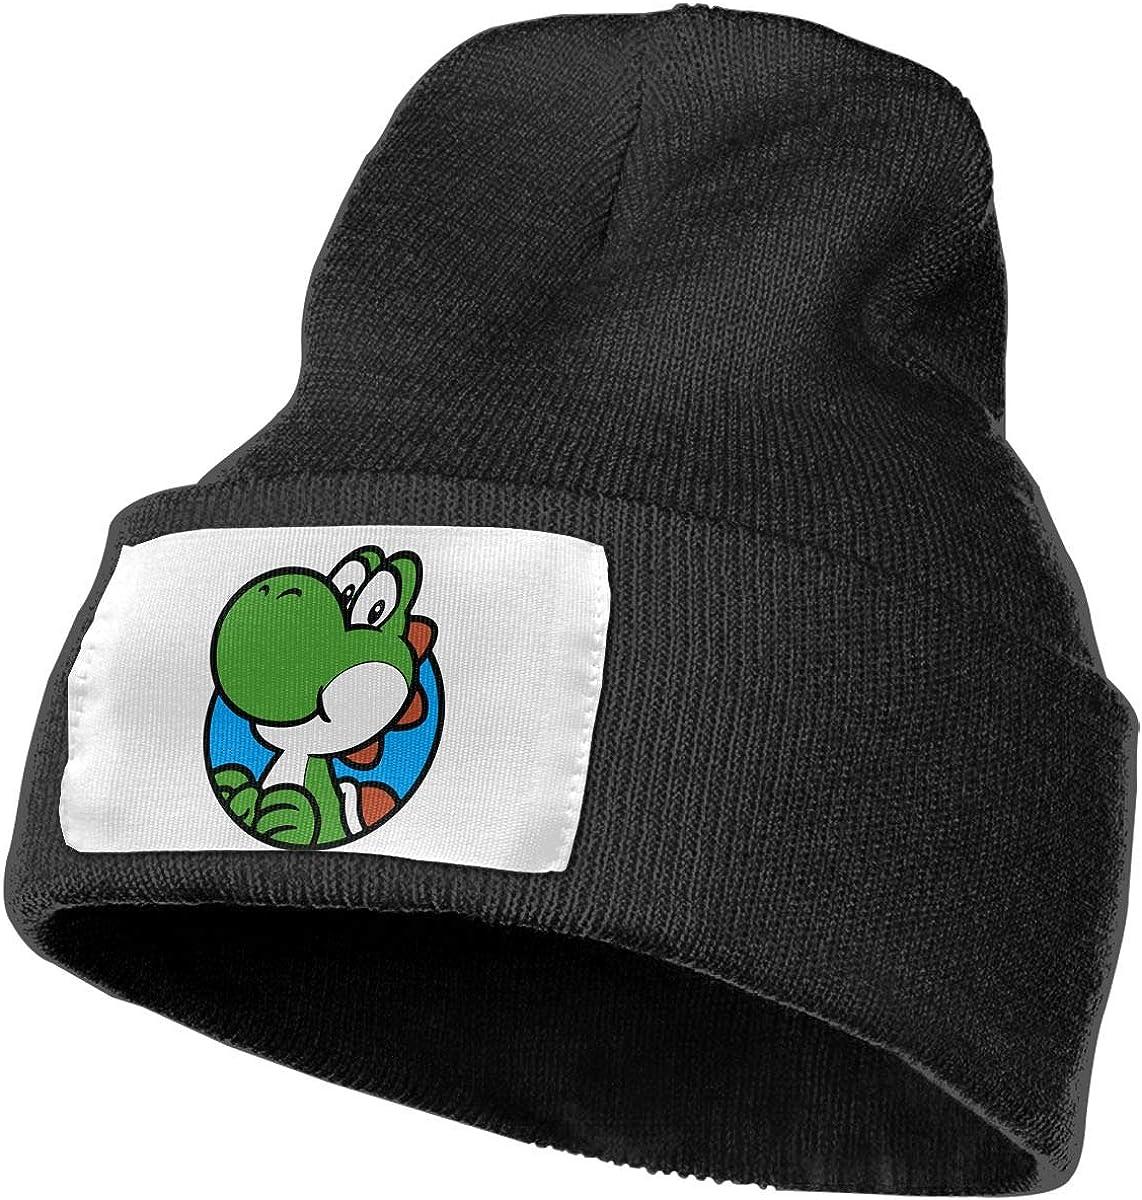 TAOMAP89 Dinosaur Companion Women and Men Skull Caps Winter Warm Stretchy Knit Beanie Hats